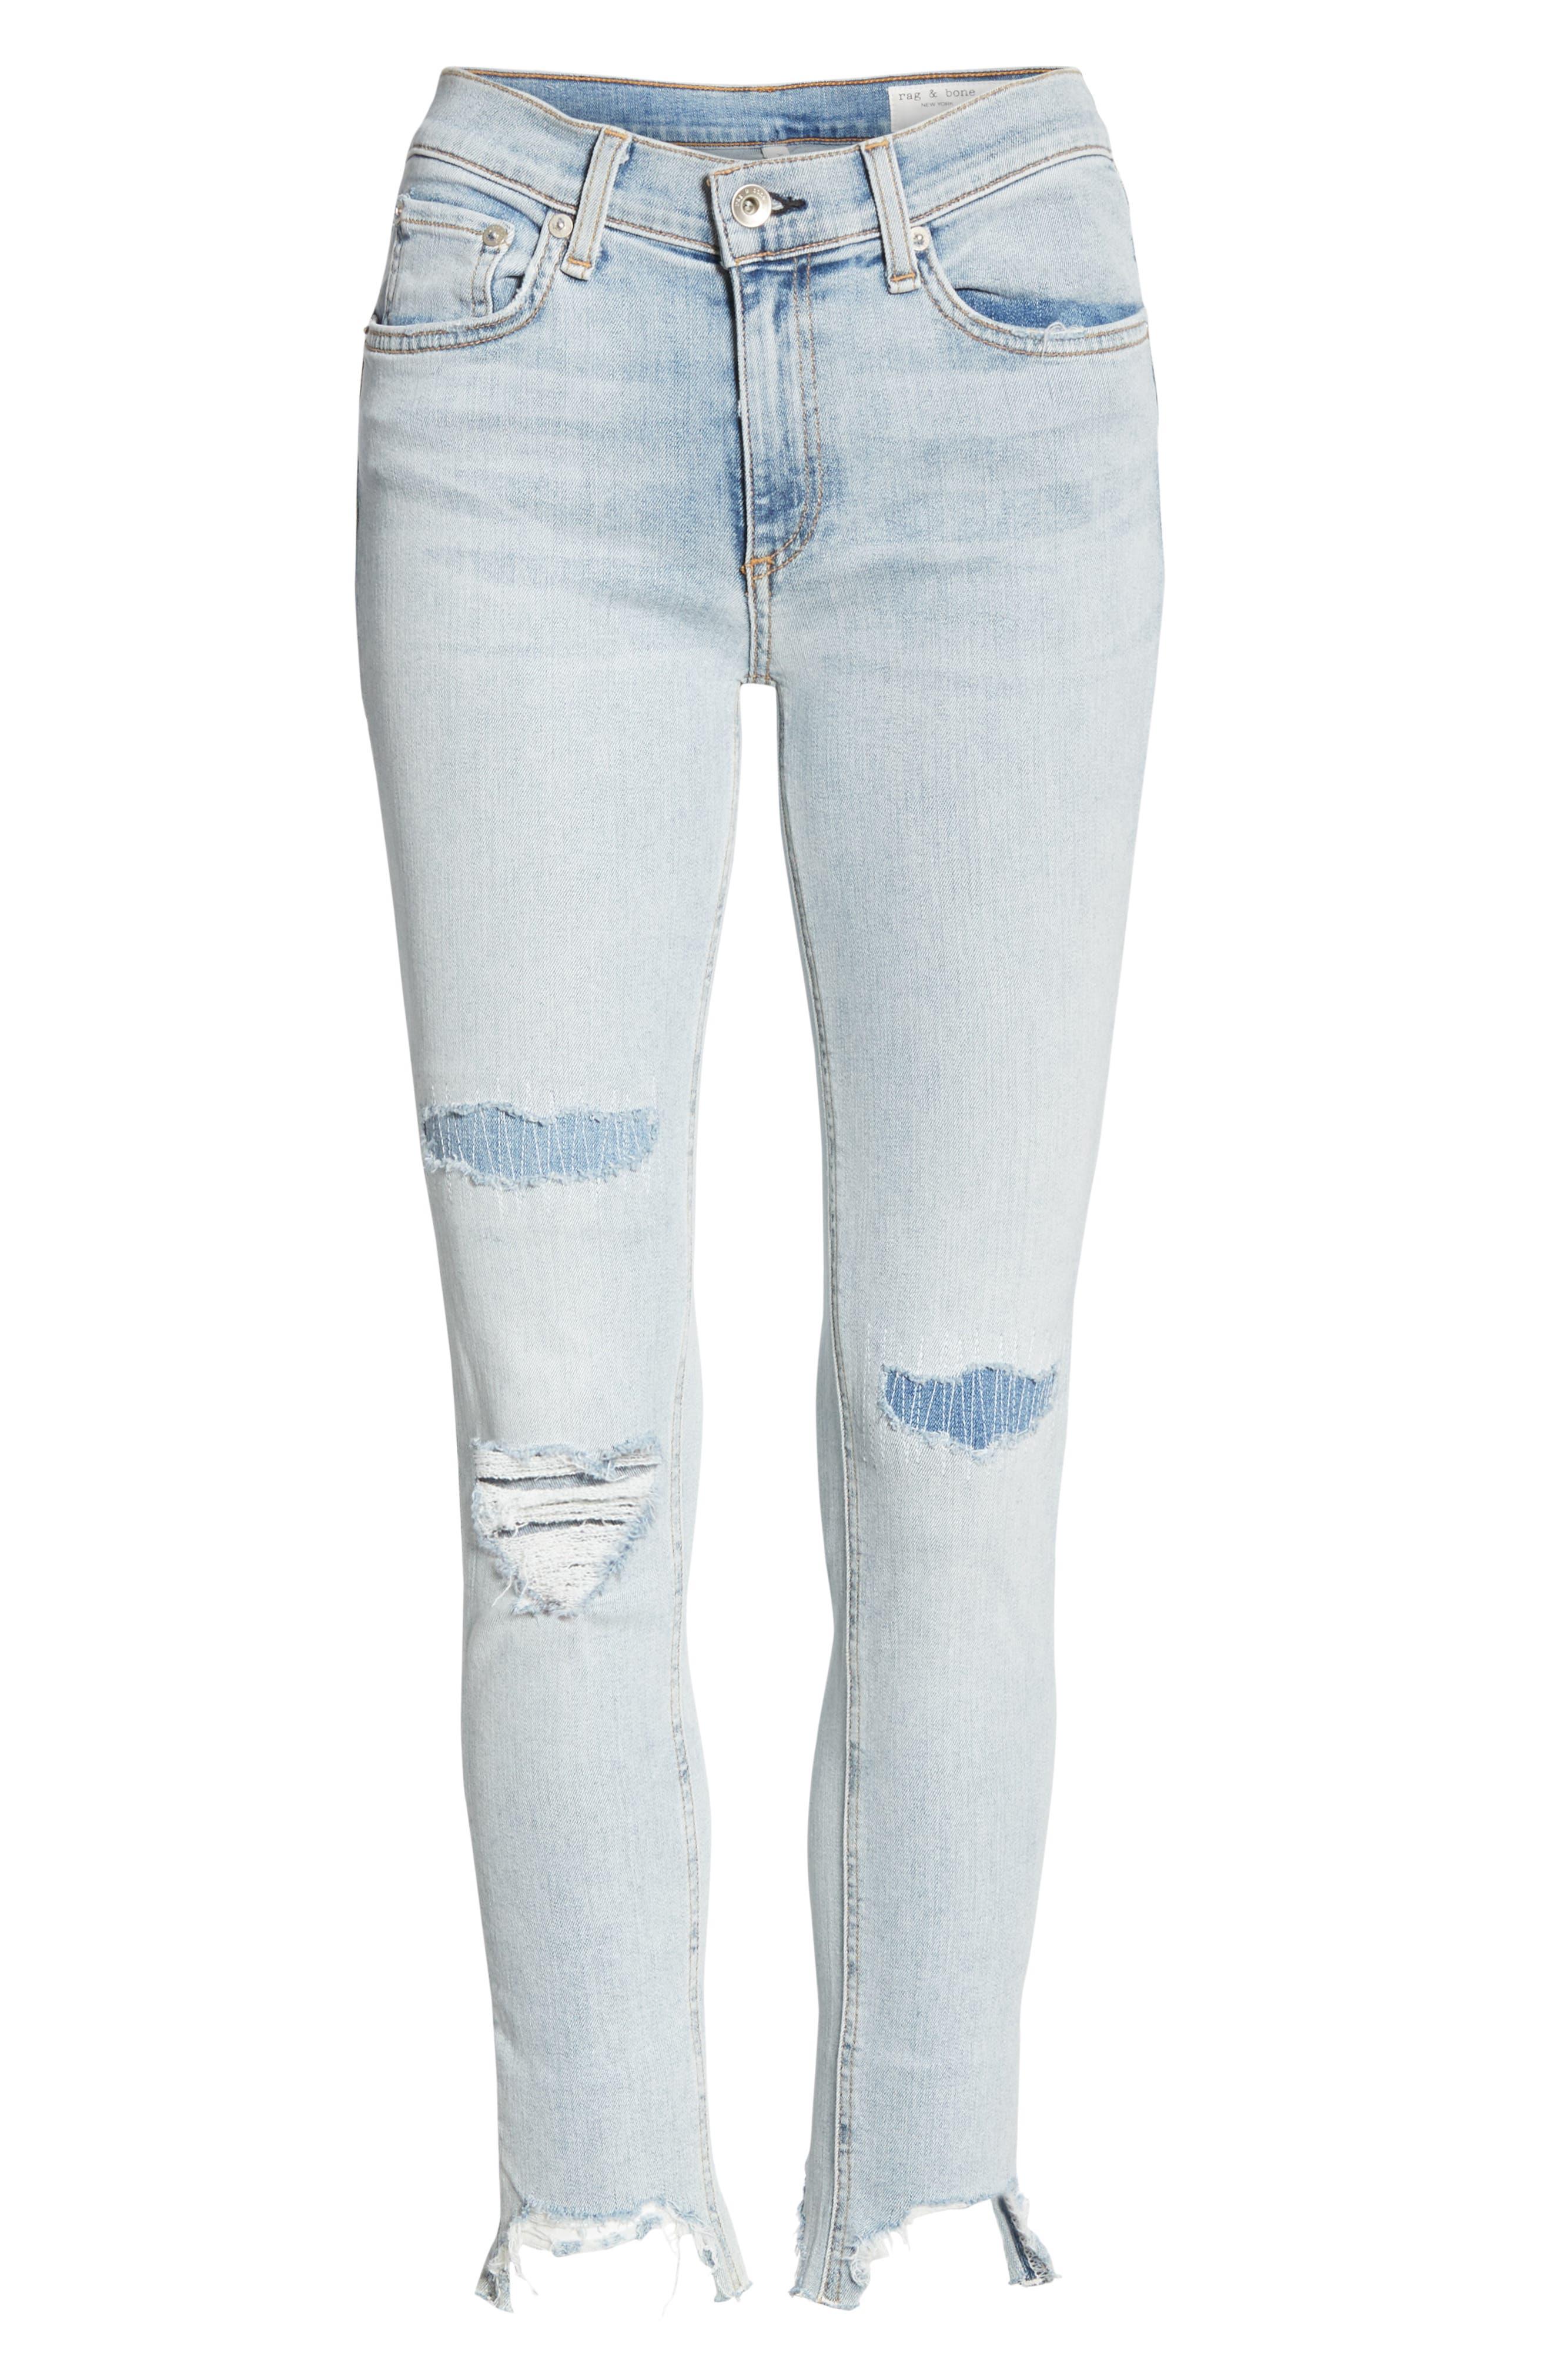 RAG & BONE,                             JEAN Ripped Ankle Skinny Jeans,                             Alternate thumbnail 7, color,                             LYNN W HOLES